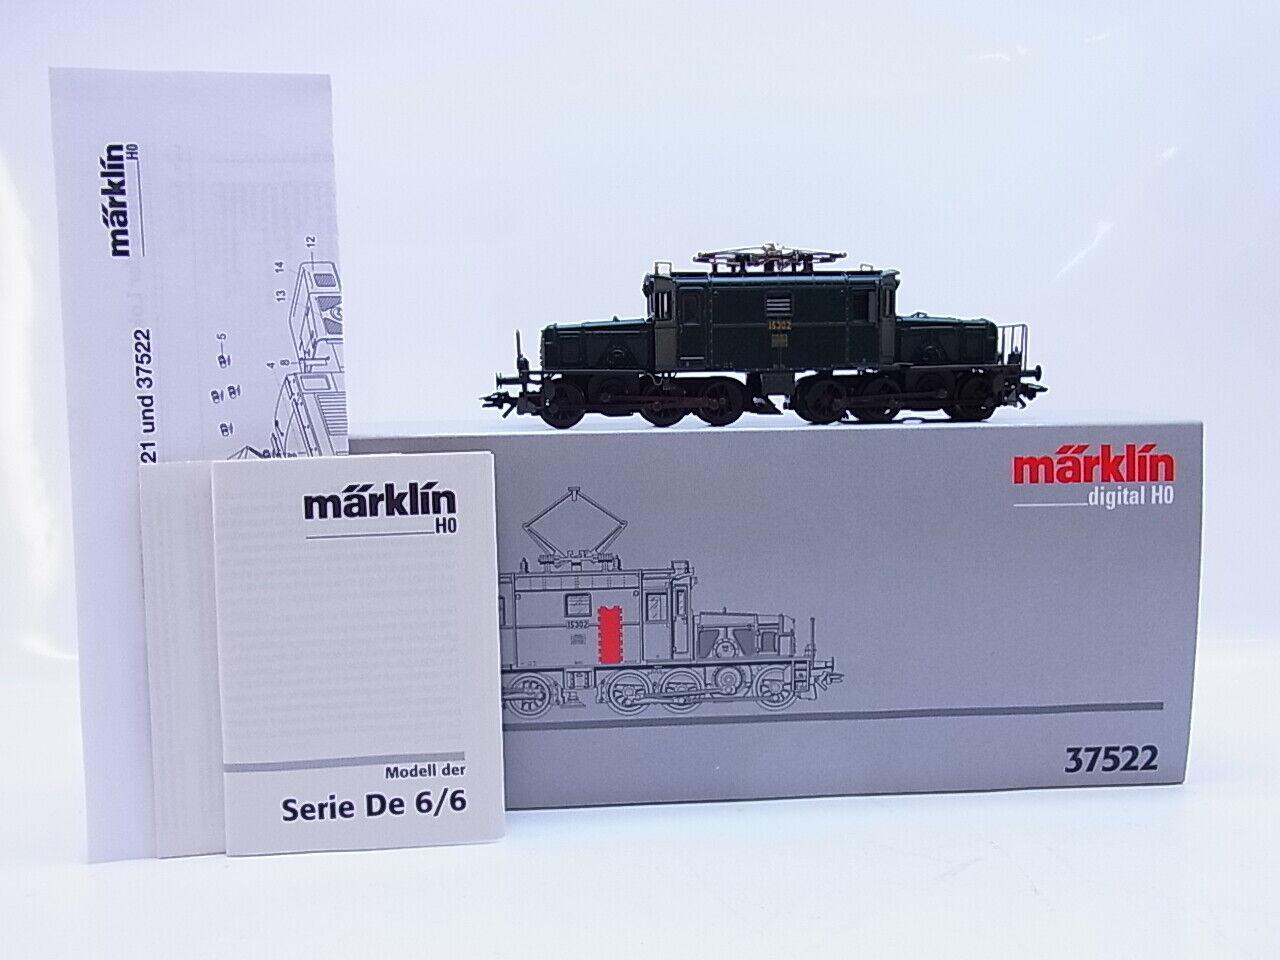 Lot 56930   Märklin h0 37522 e-Lok serie de 6 6 de cocodrilo SBB digital en OVP